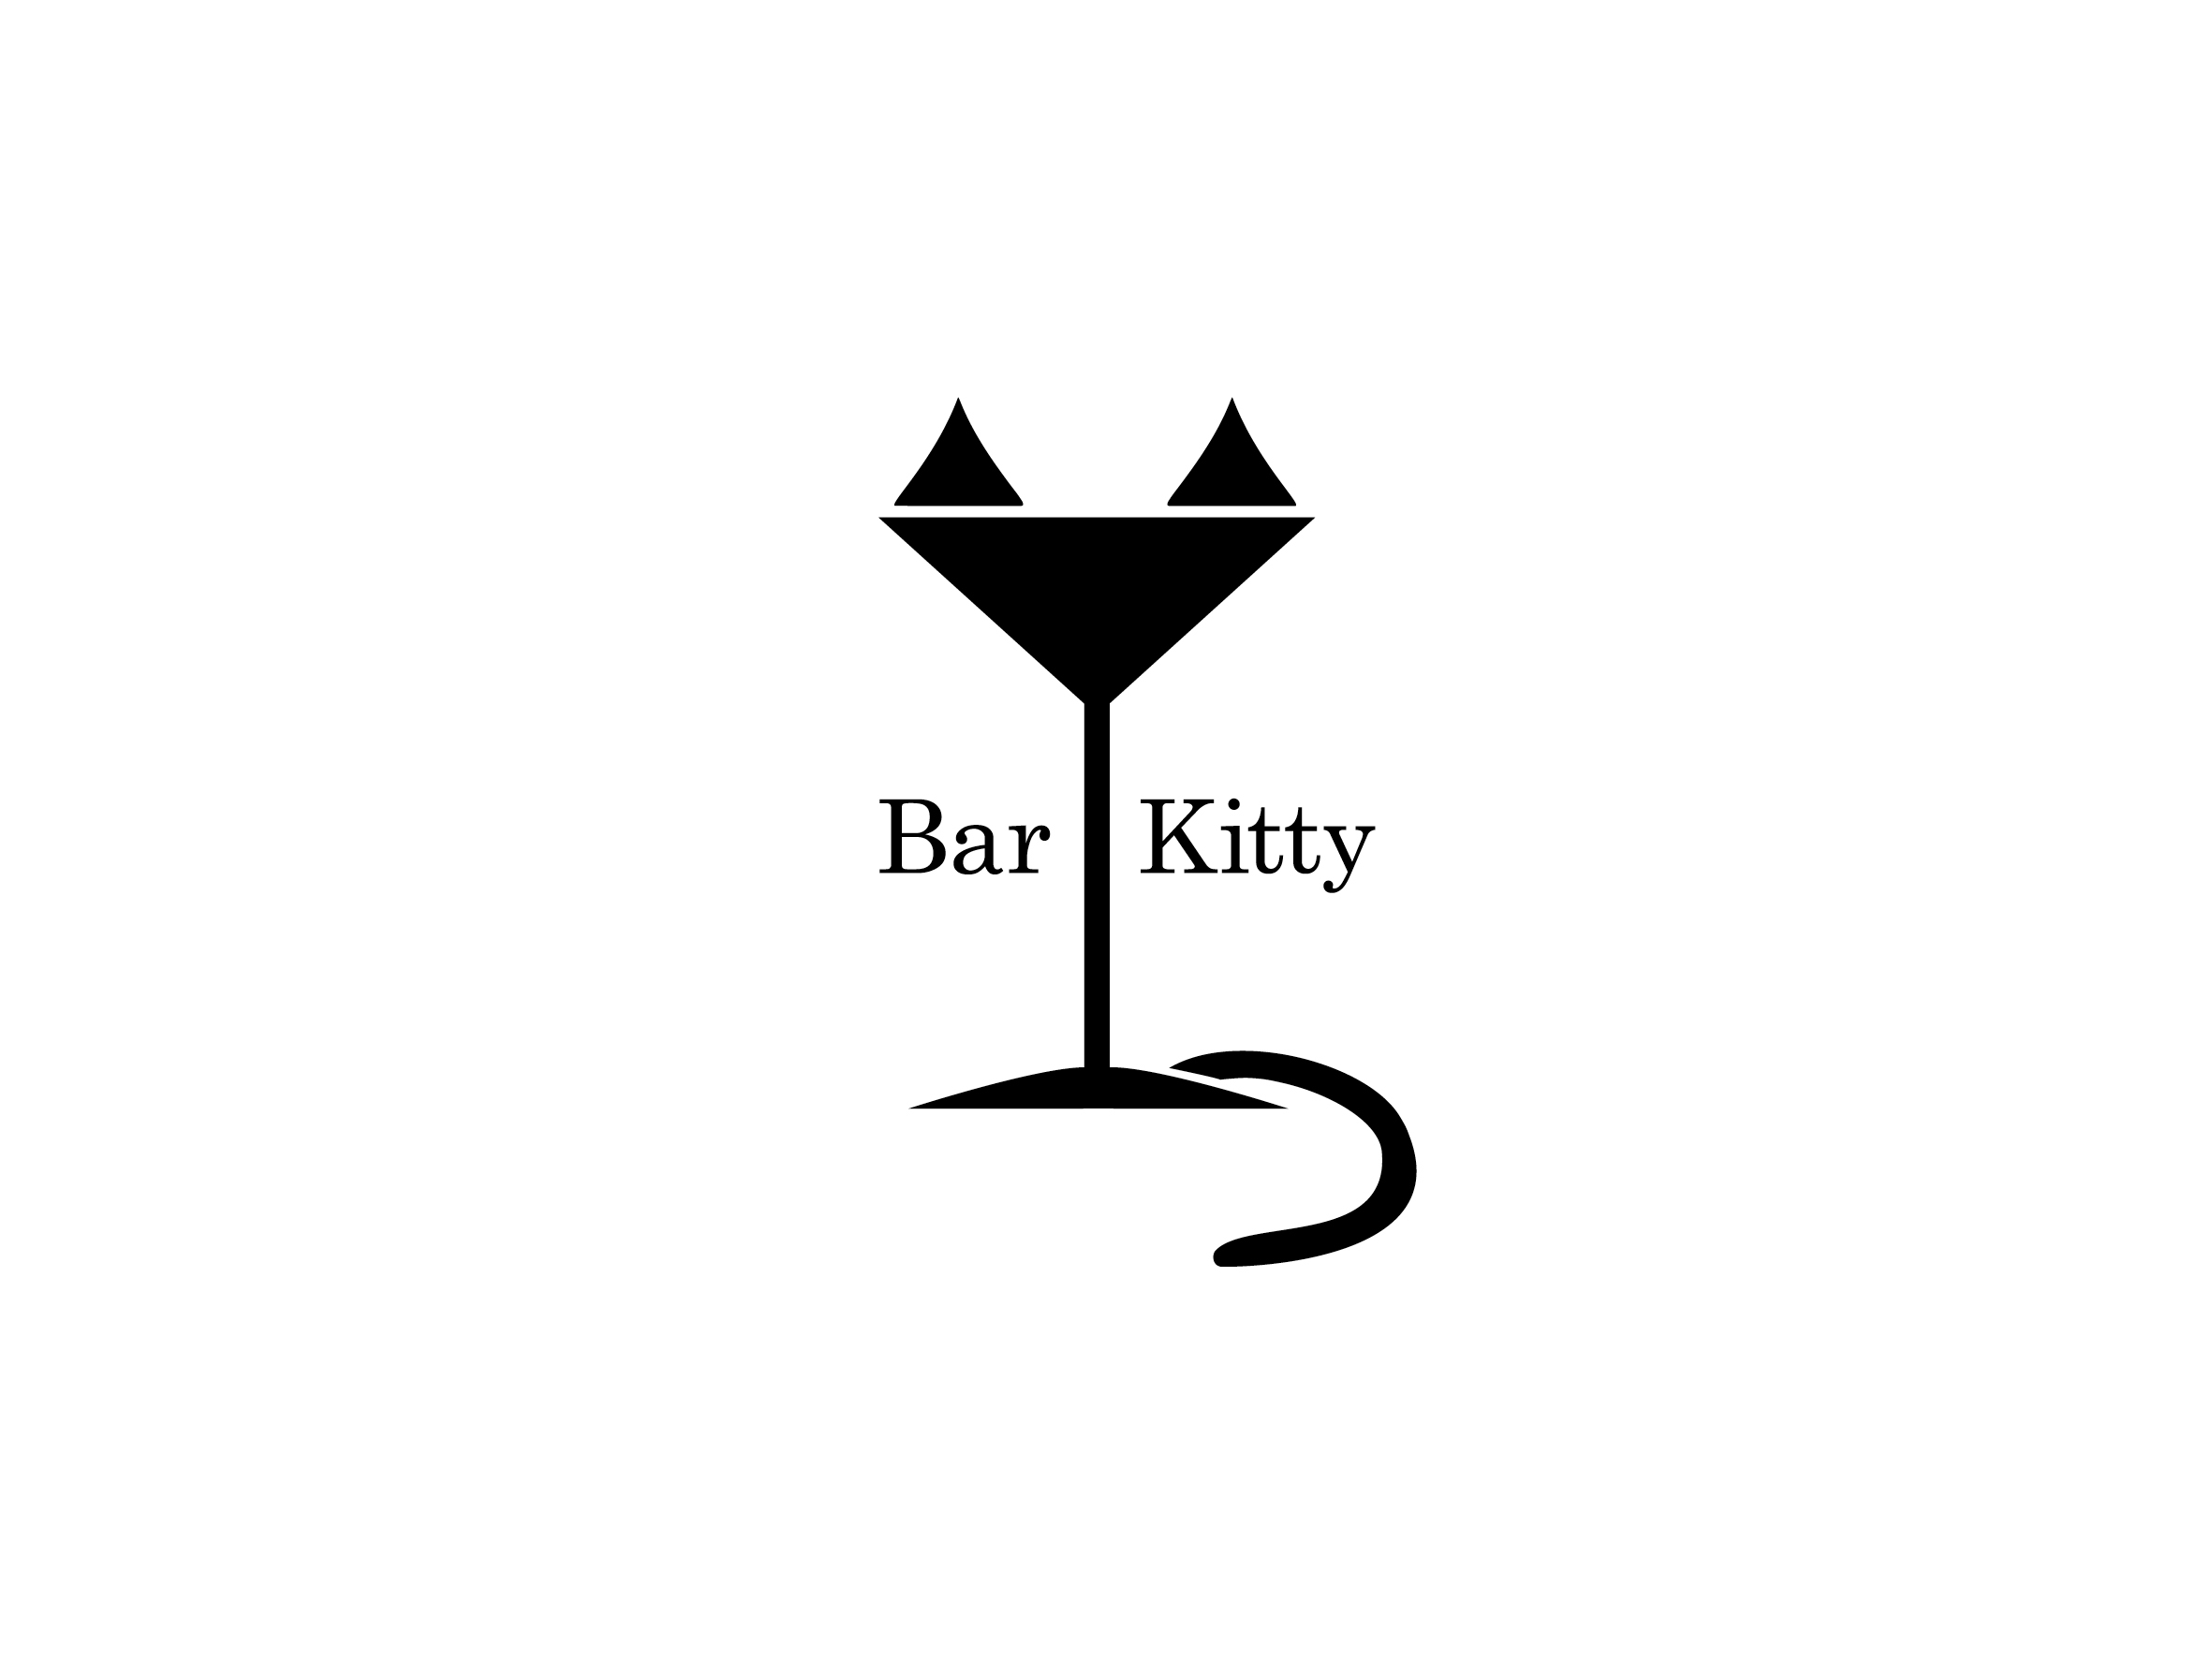 bar kitty logo design designed by Dakini Design Saltaire, Shipley, Bradford